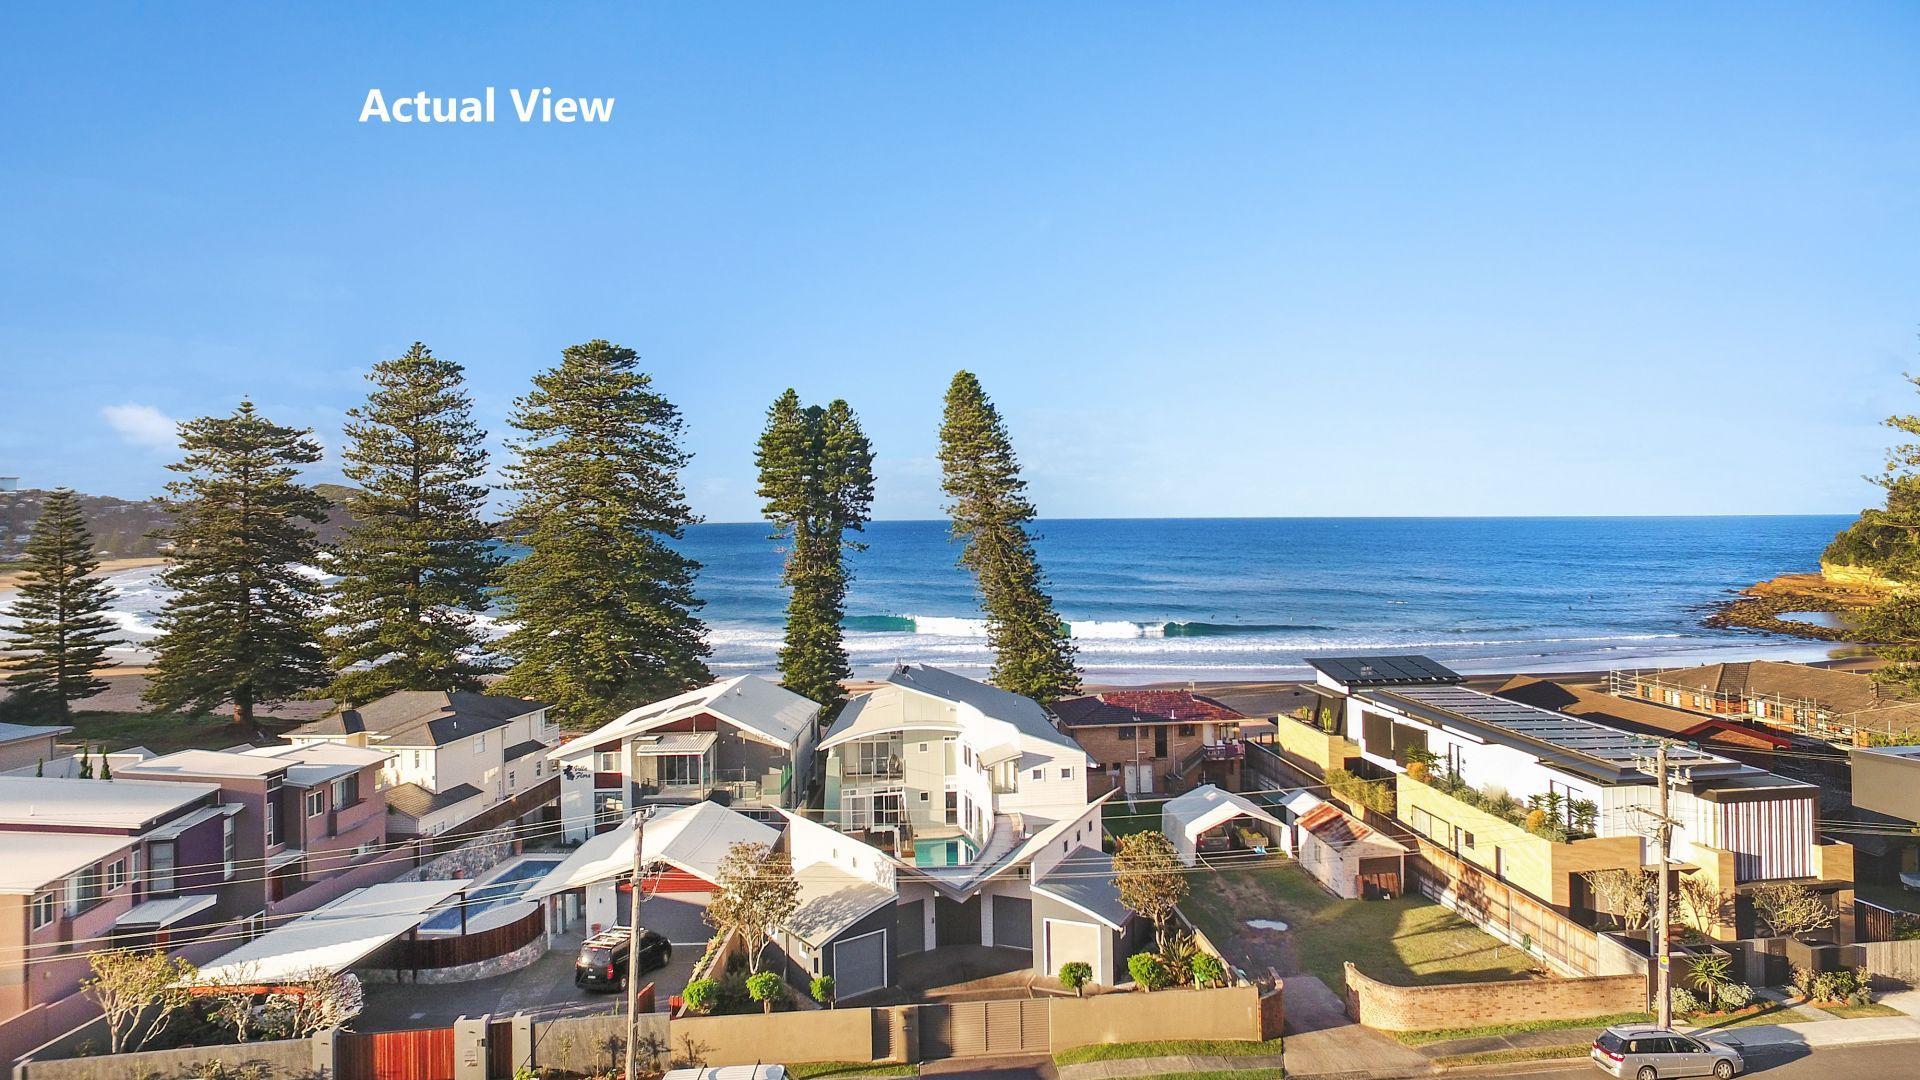 132 Avoca Drive, Avoca Beach NSW 2251 - Vacant Land For Sale